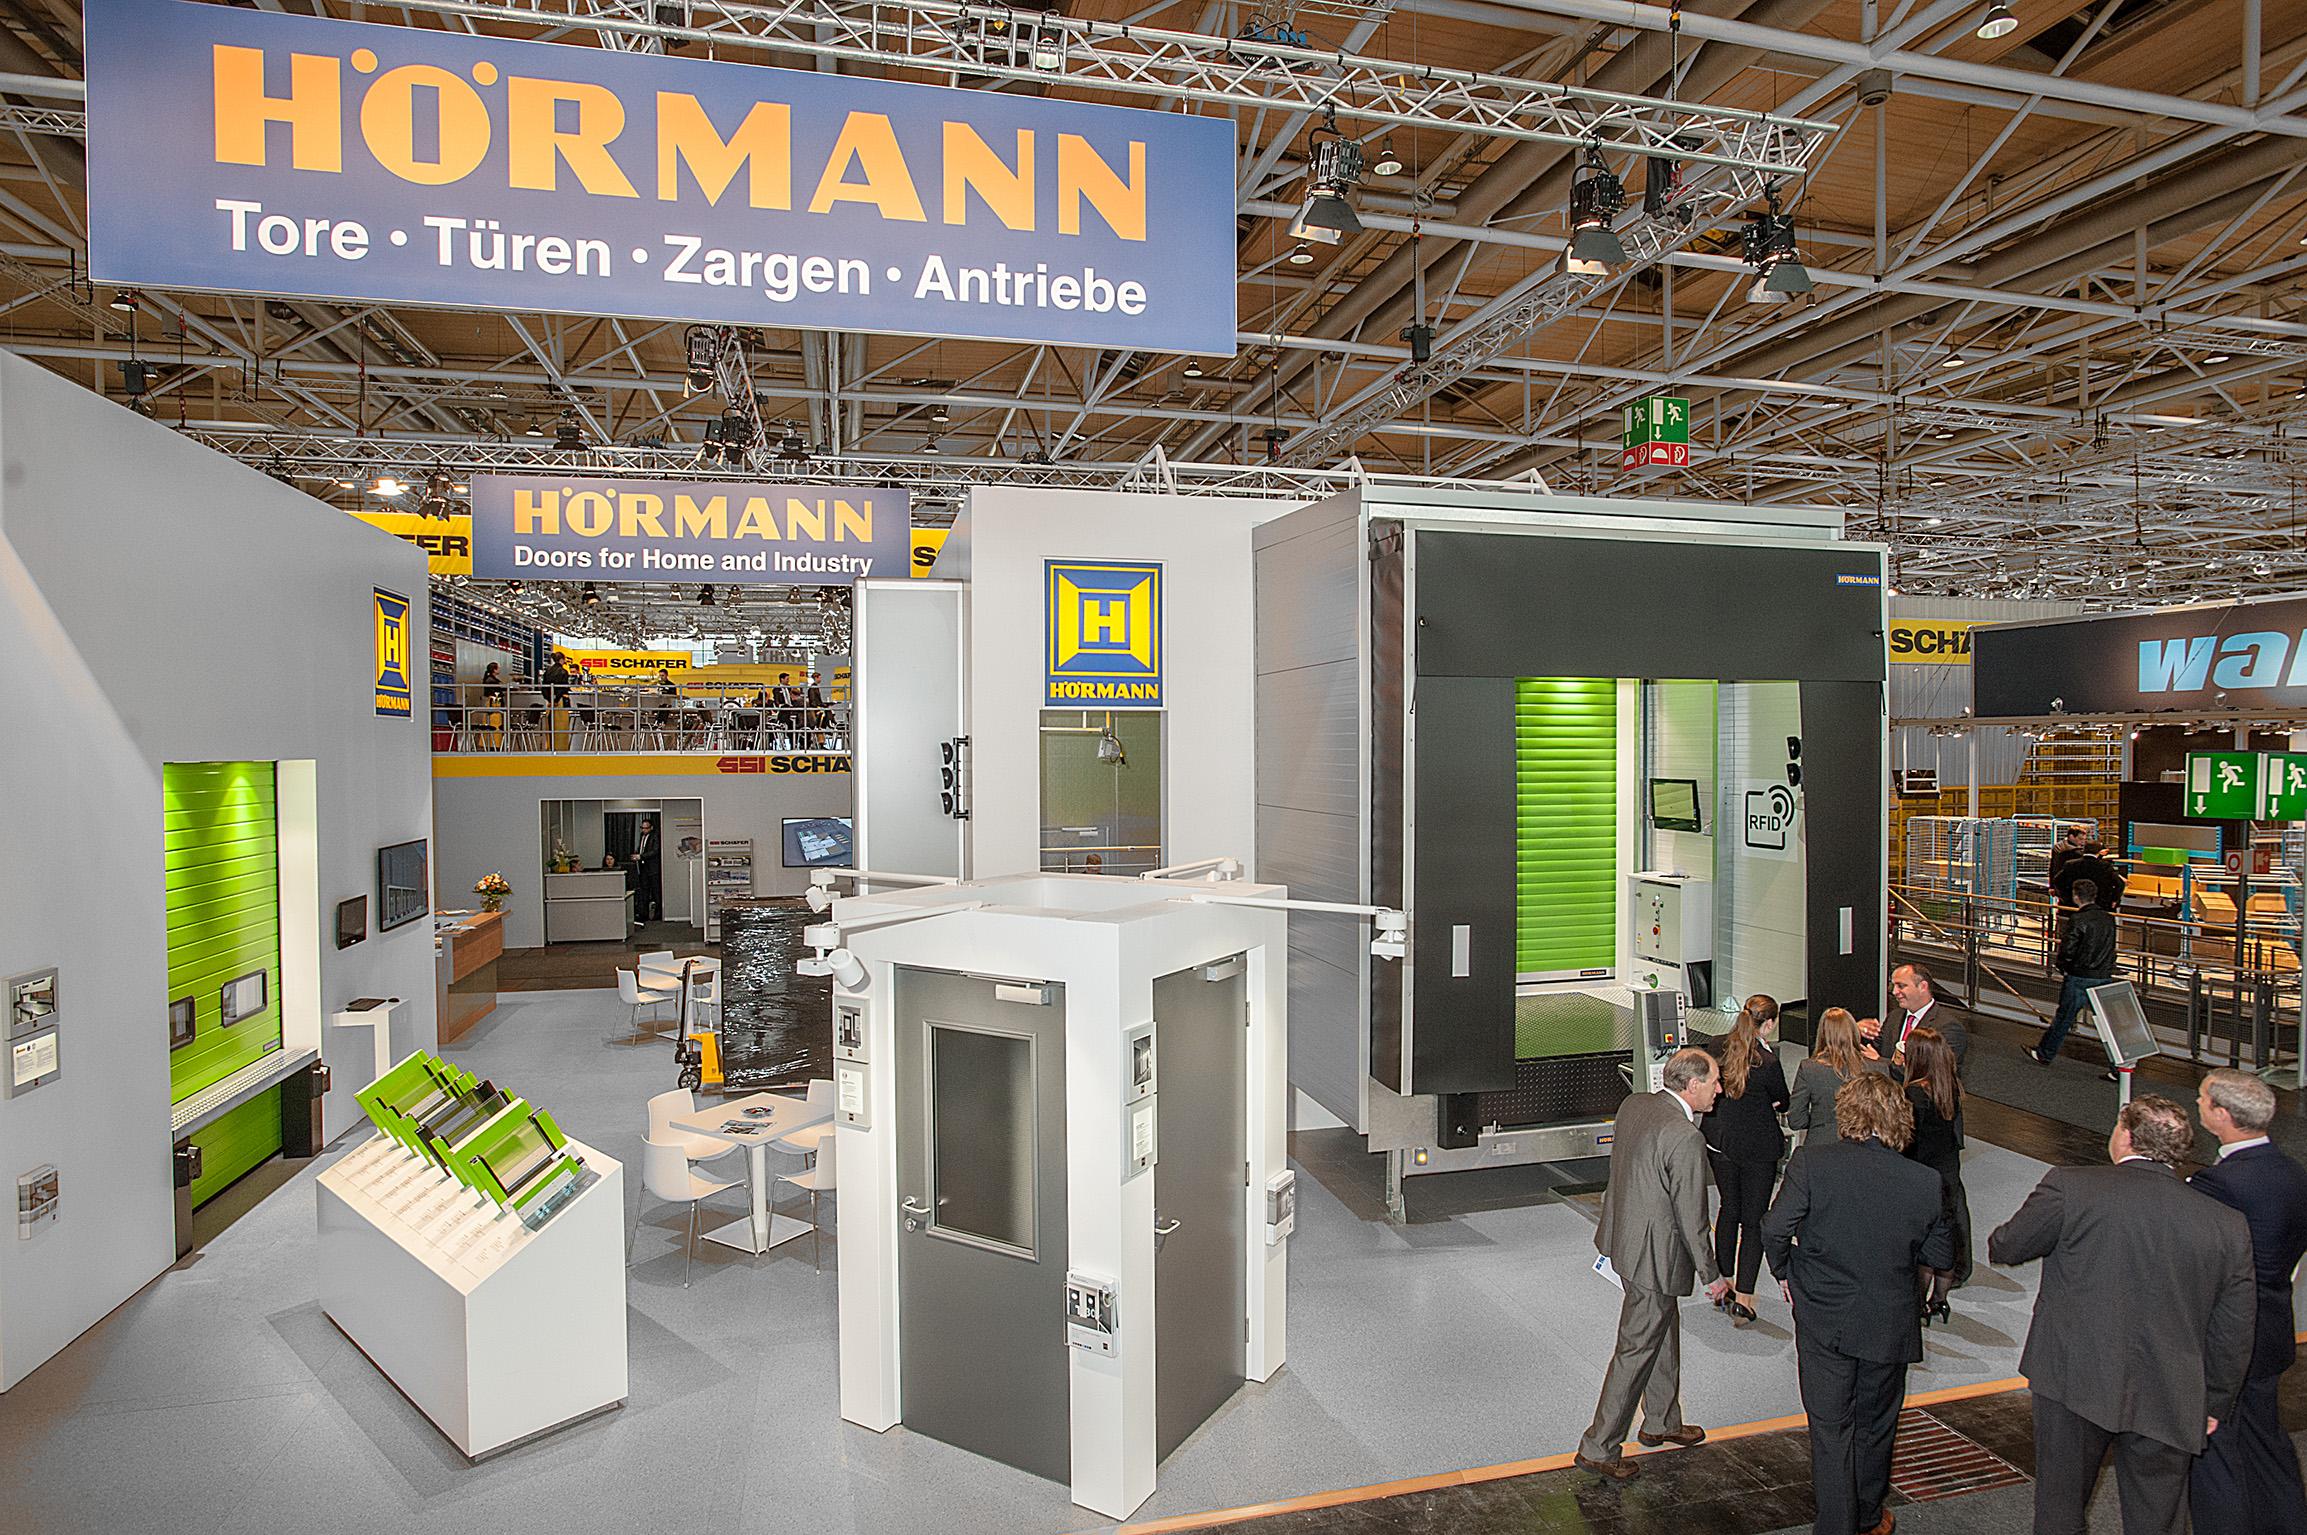 Hörmann Hannover innovative soluzioni per l intralogistica presentate da hormann ad